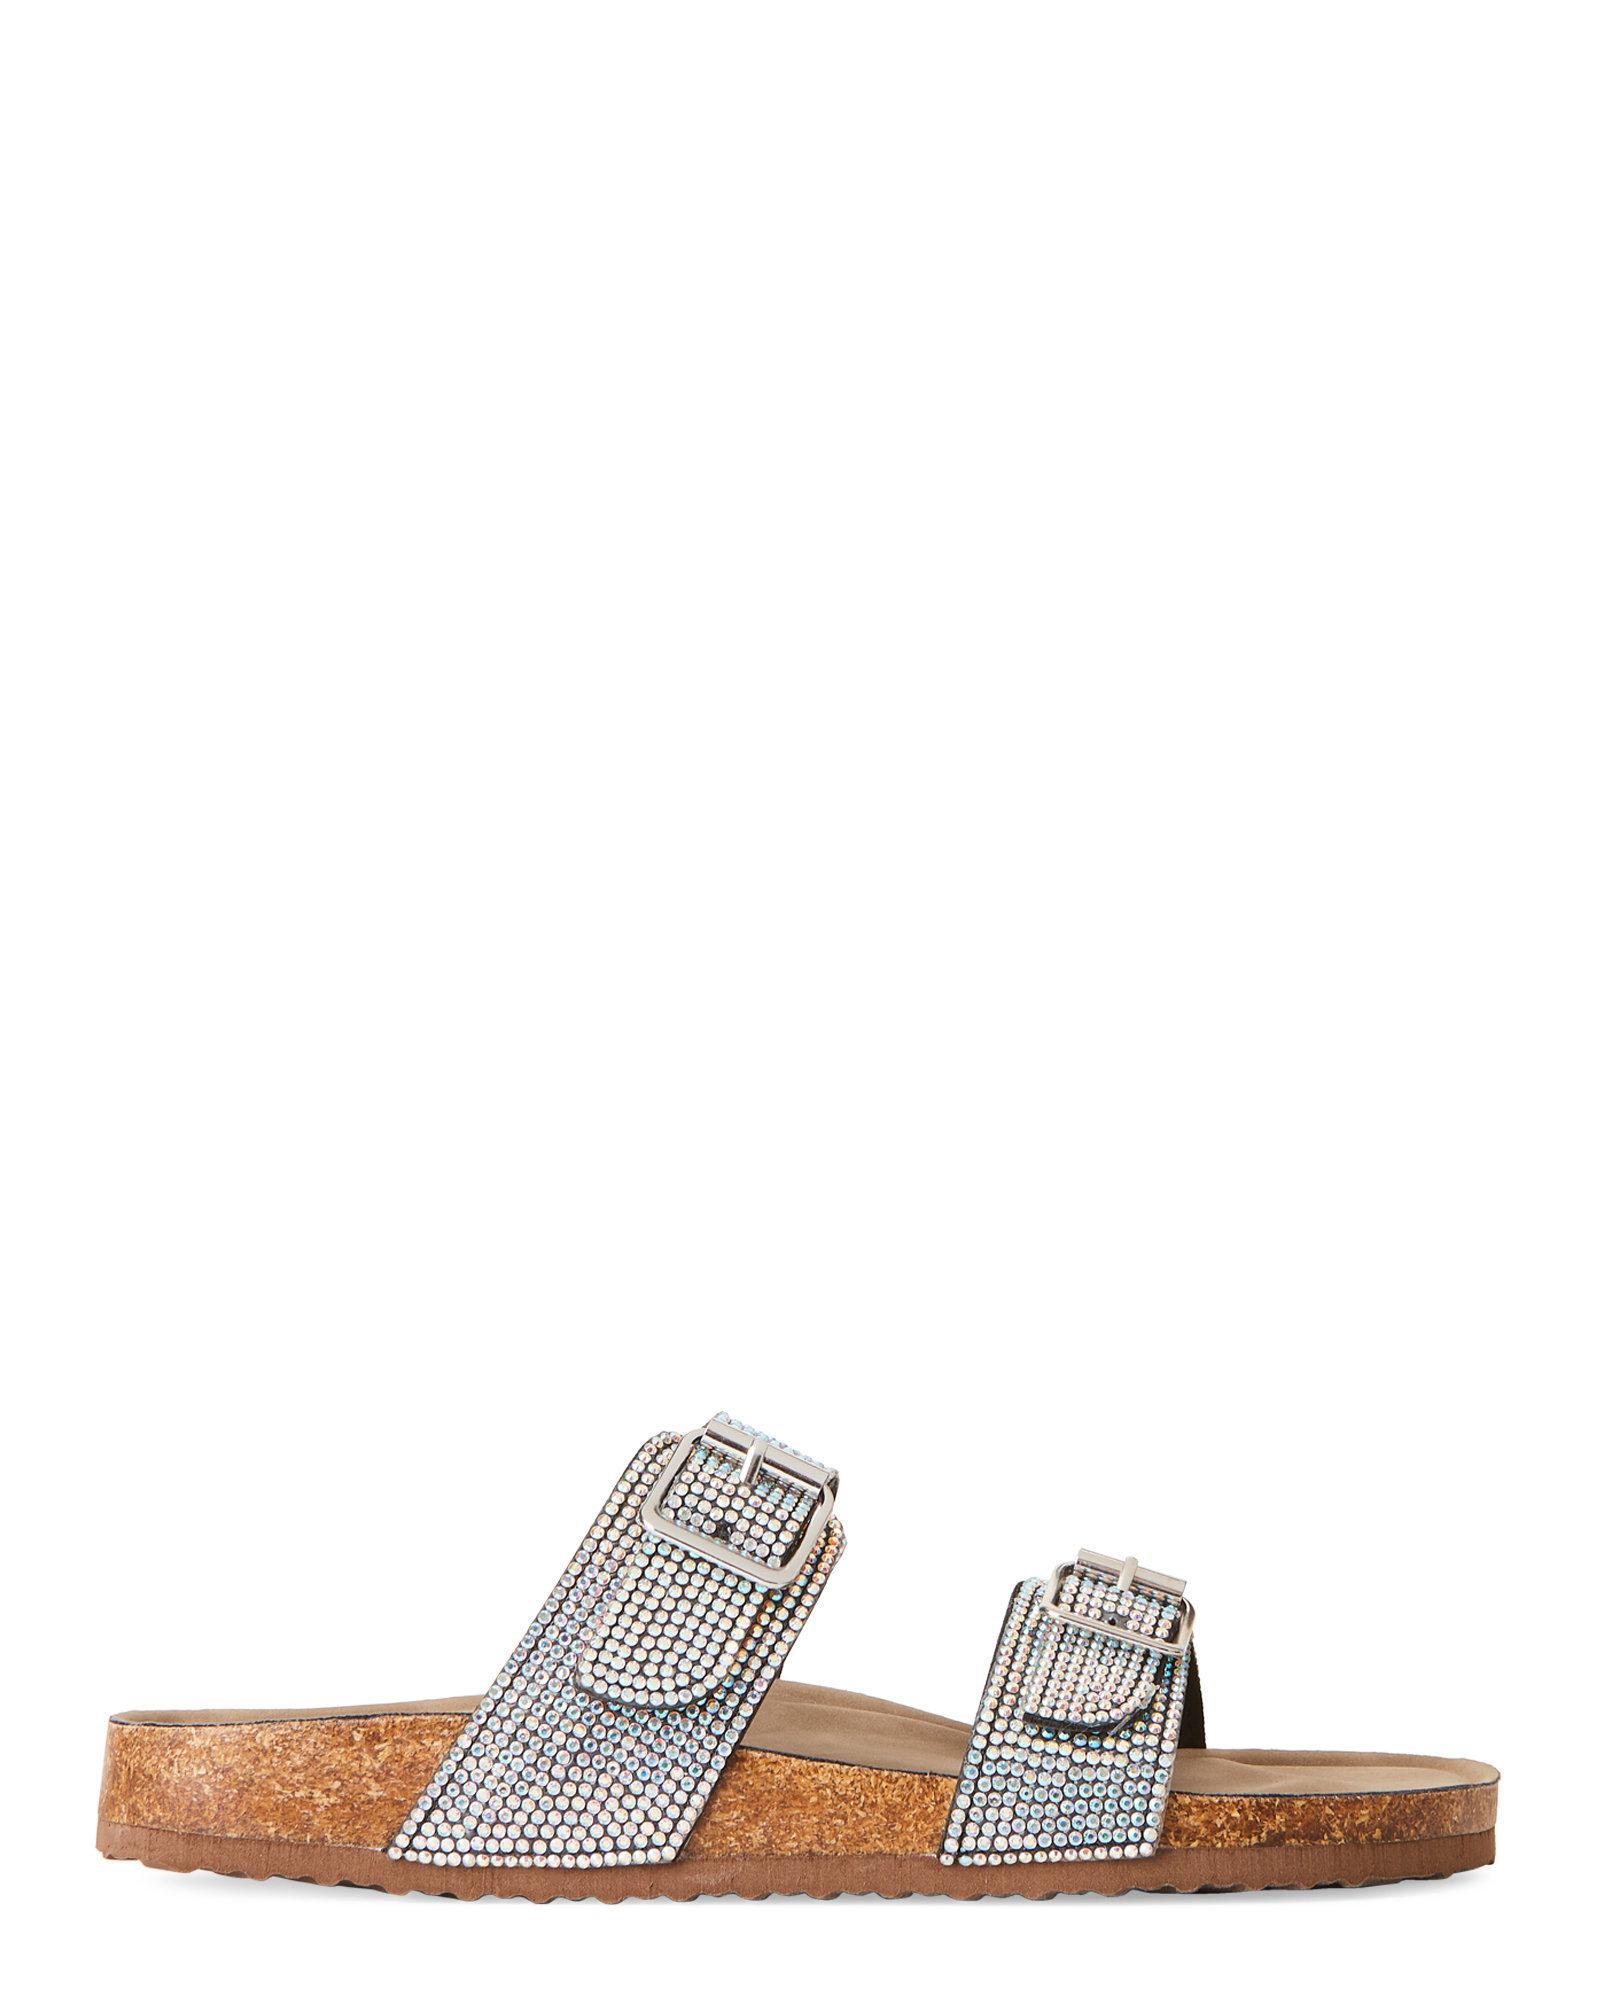 1113a30ebe4bdd Lyst - Madden Girl Iridescent Brando Embellished Footbed Sandals